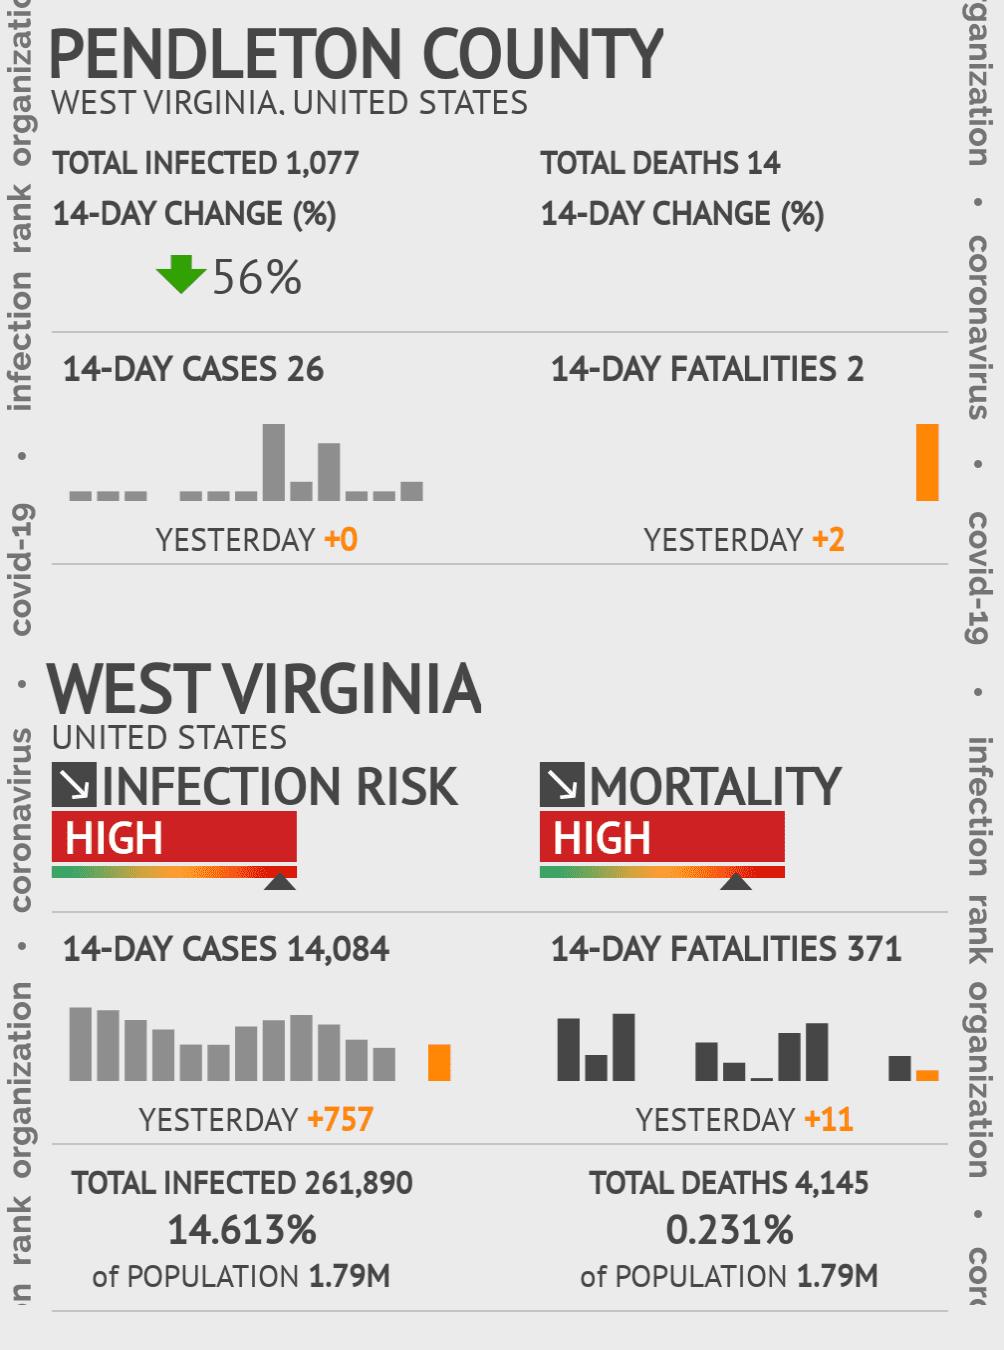 Pendleton County Coronavirus Covid-19 Risk of Infection on July 24, 2021